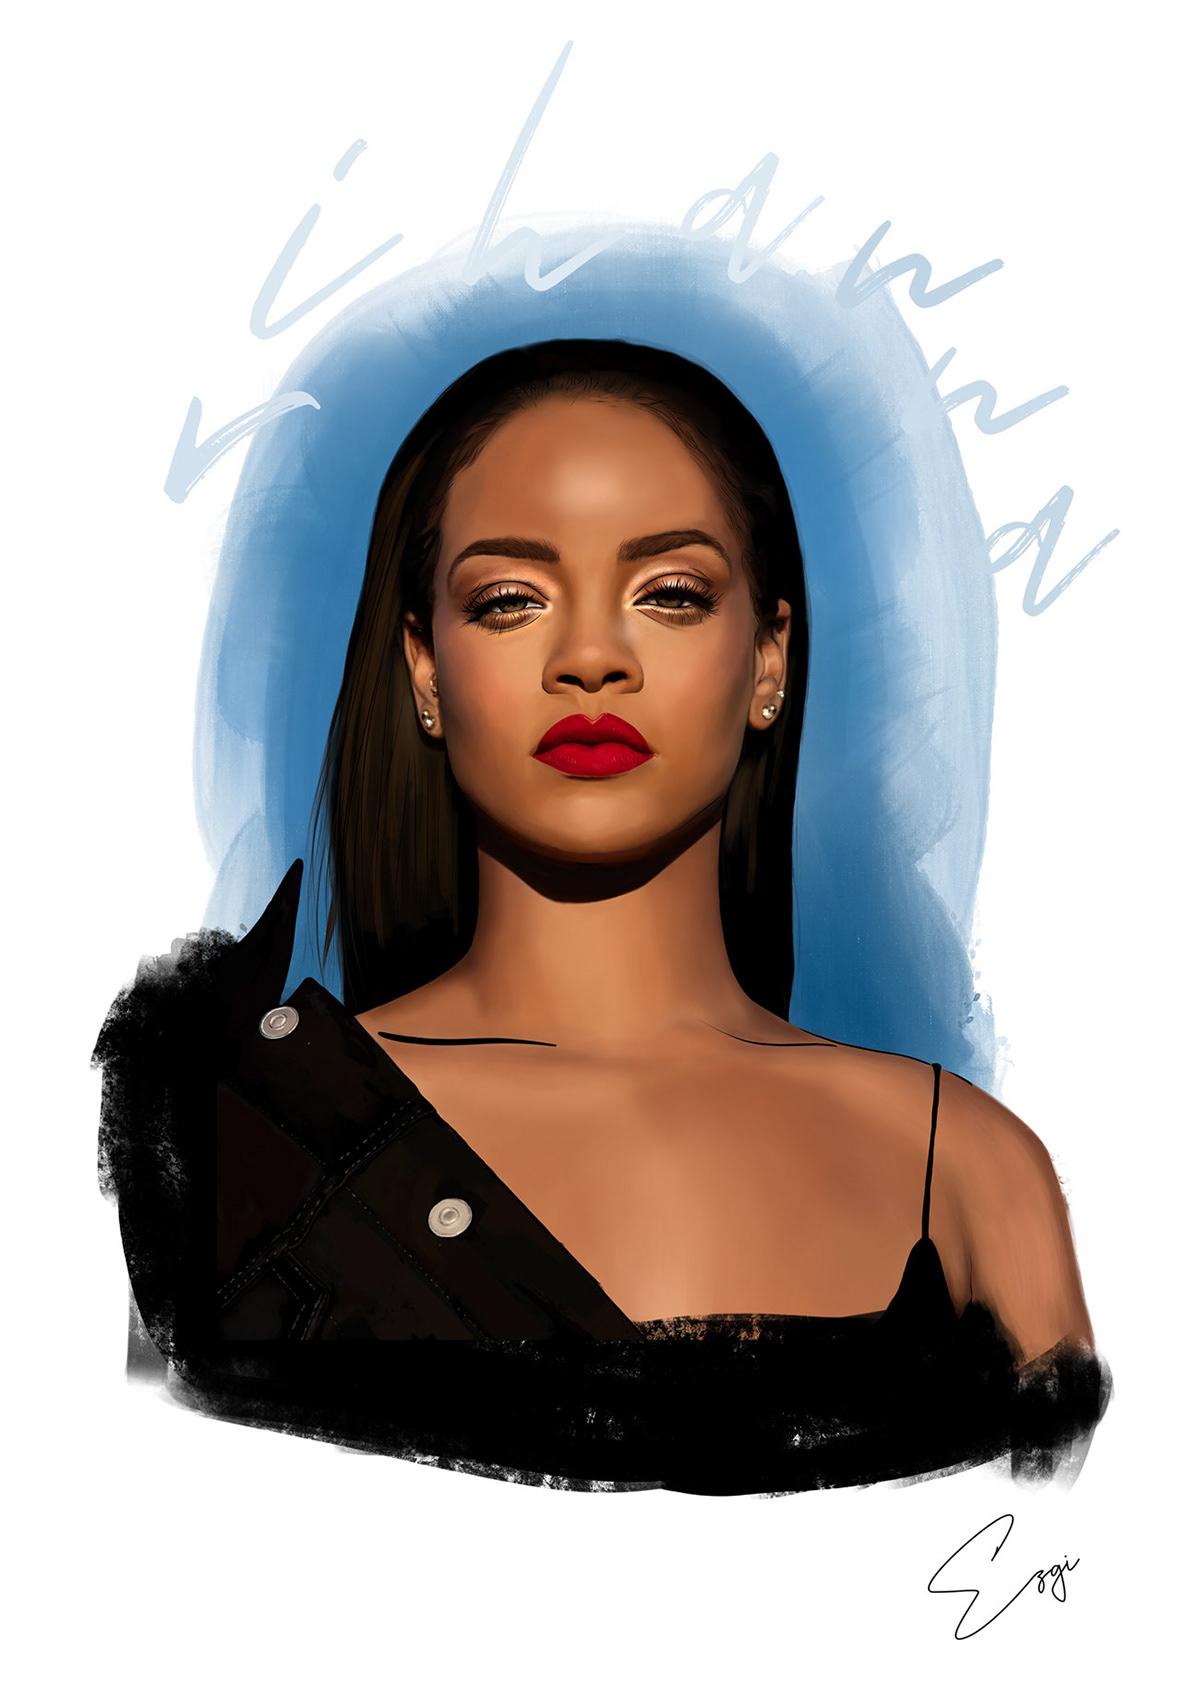 draw ILLUSTRATION  ipad pro Procreate Rihanna skecth design Digital Art  music poster